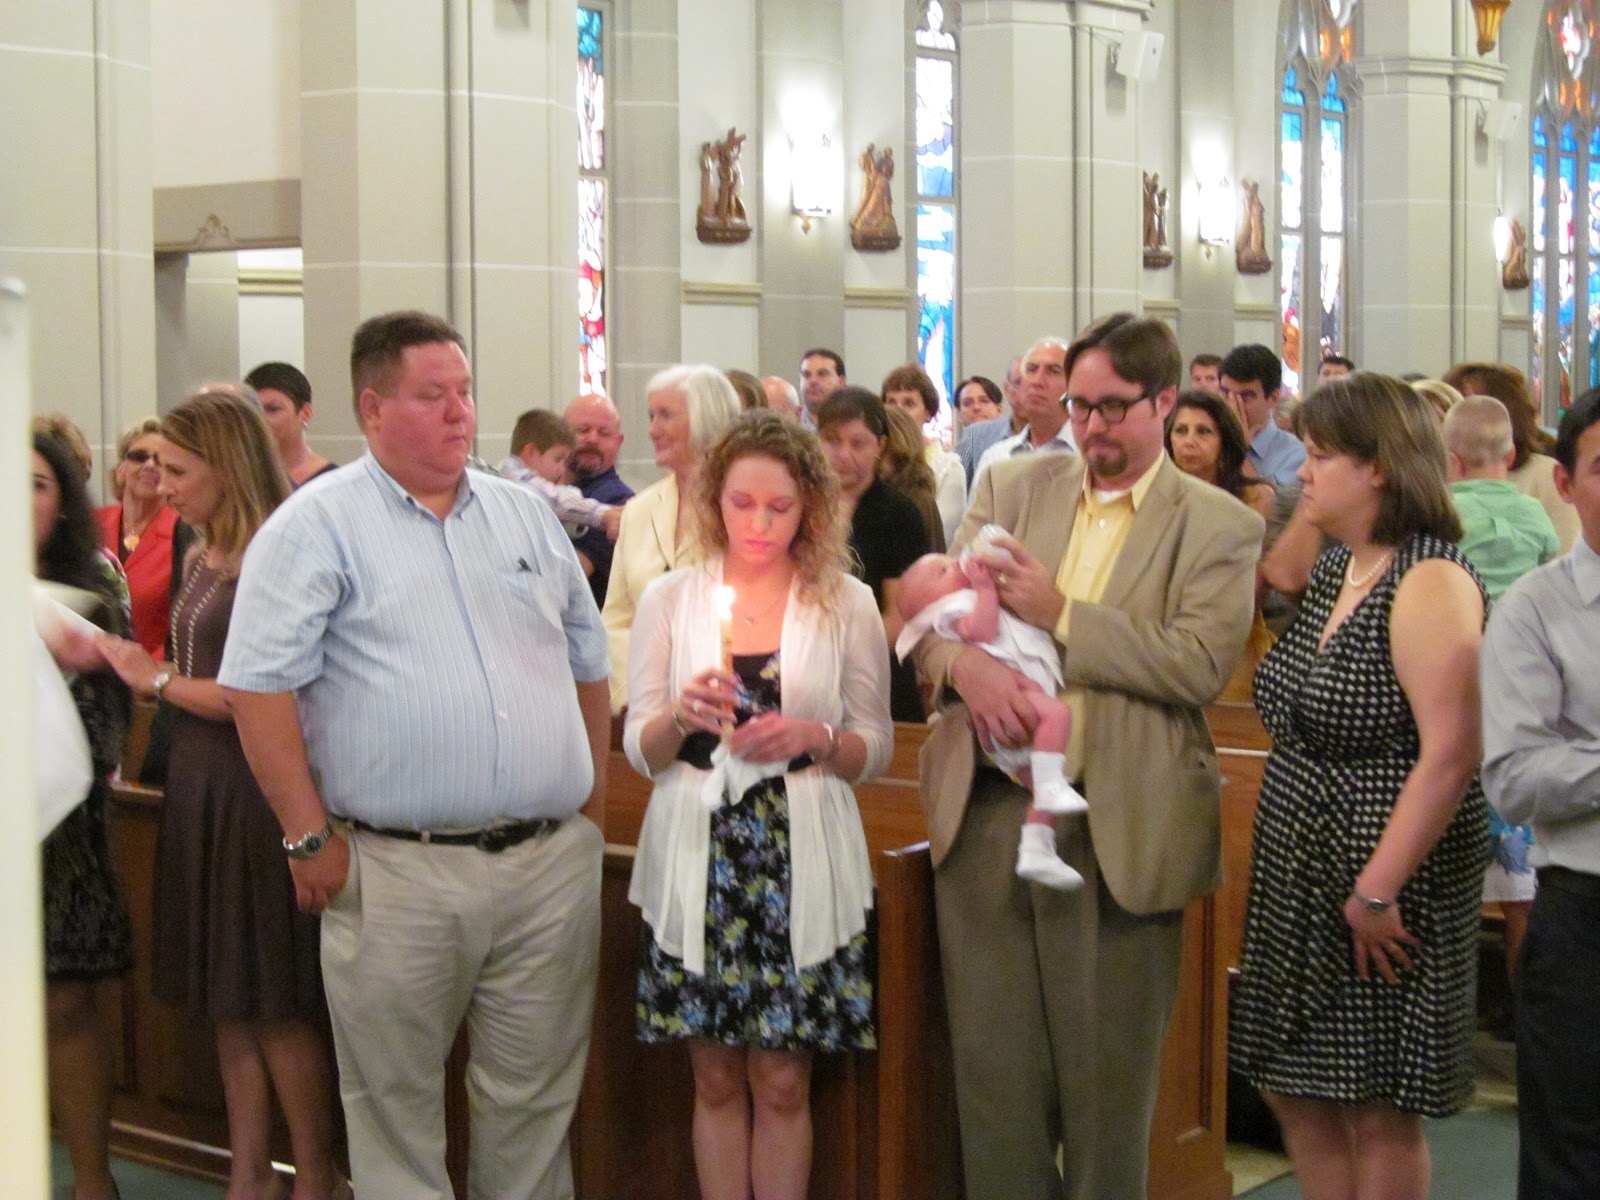 Marshalls Baptism - IMG_0758.JPG